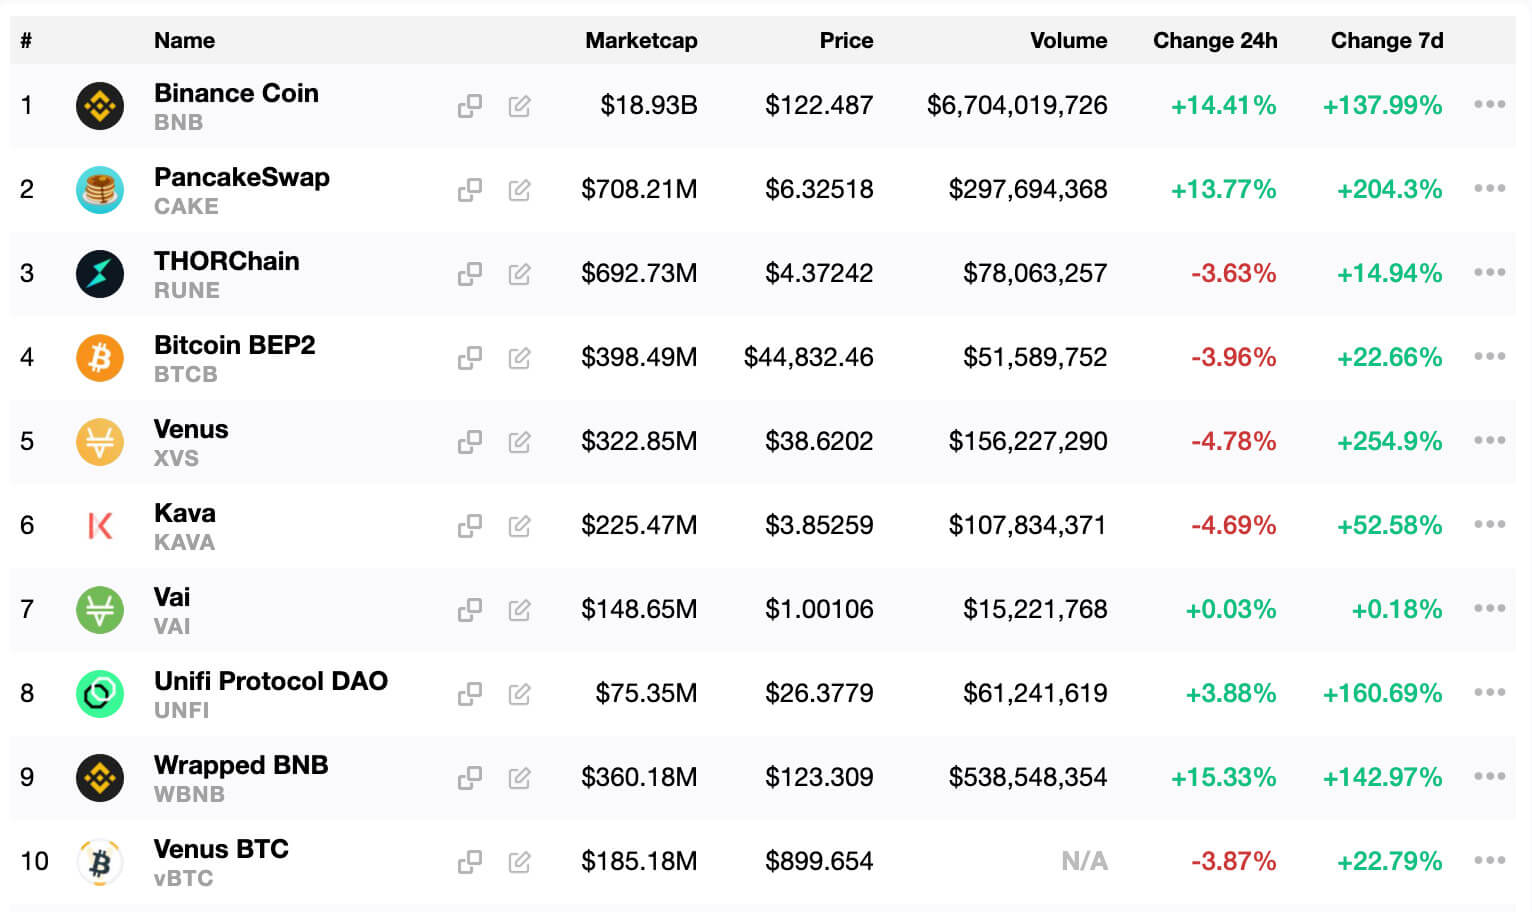 The top 10 Binance Smart Chain tokens. Image: CryptoSlate